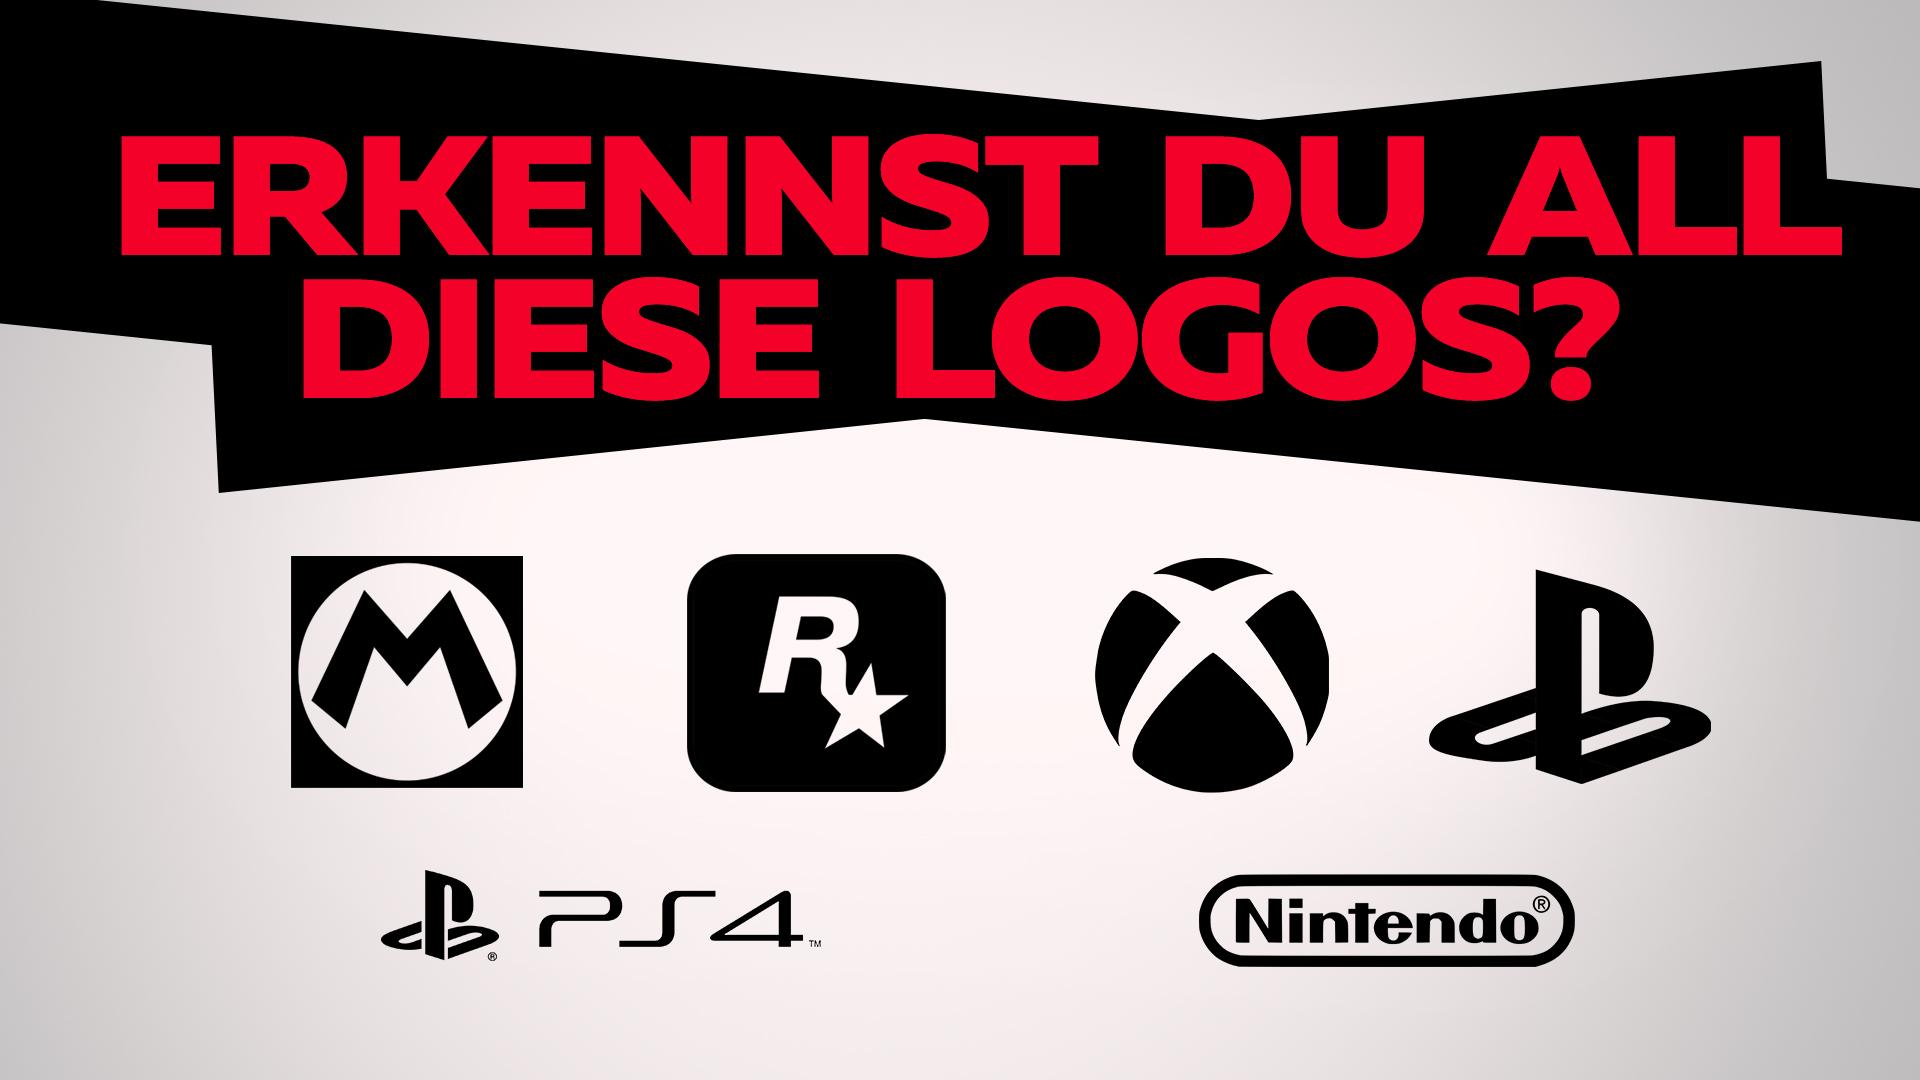 Erkennst du all diese Logos?